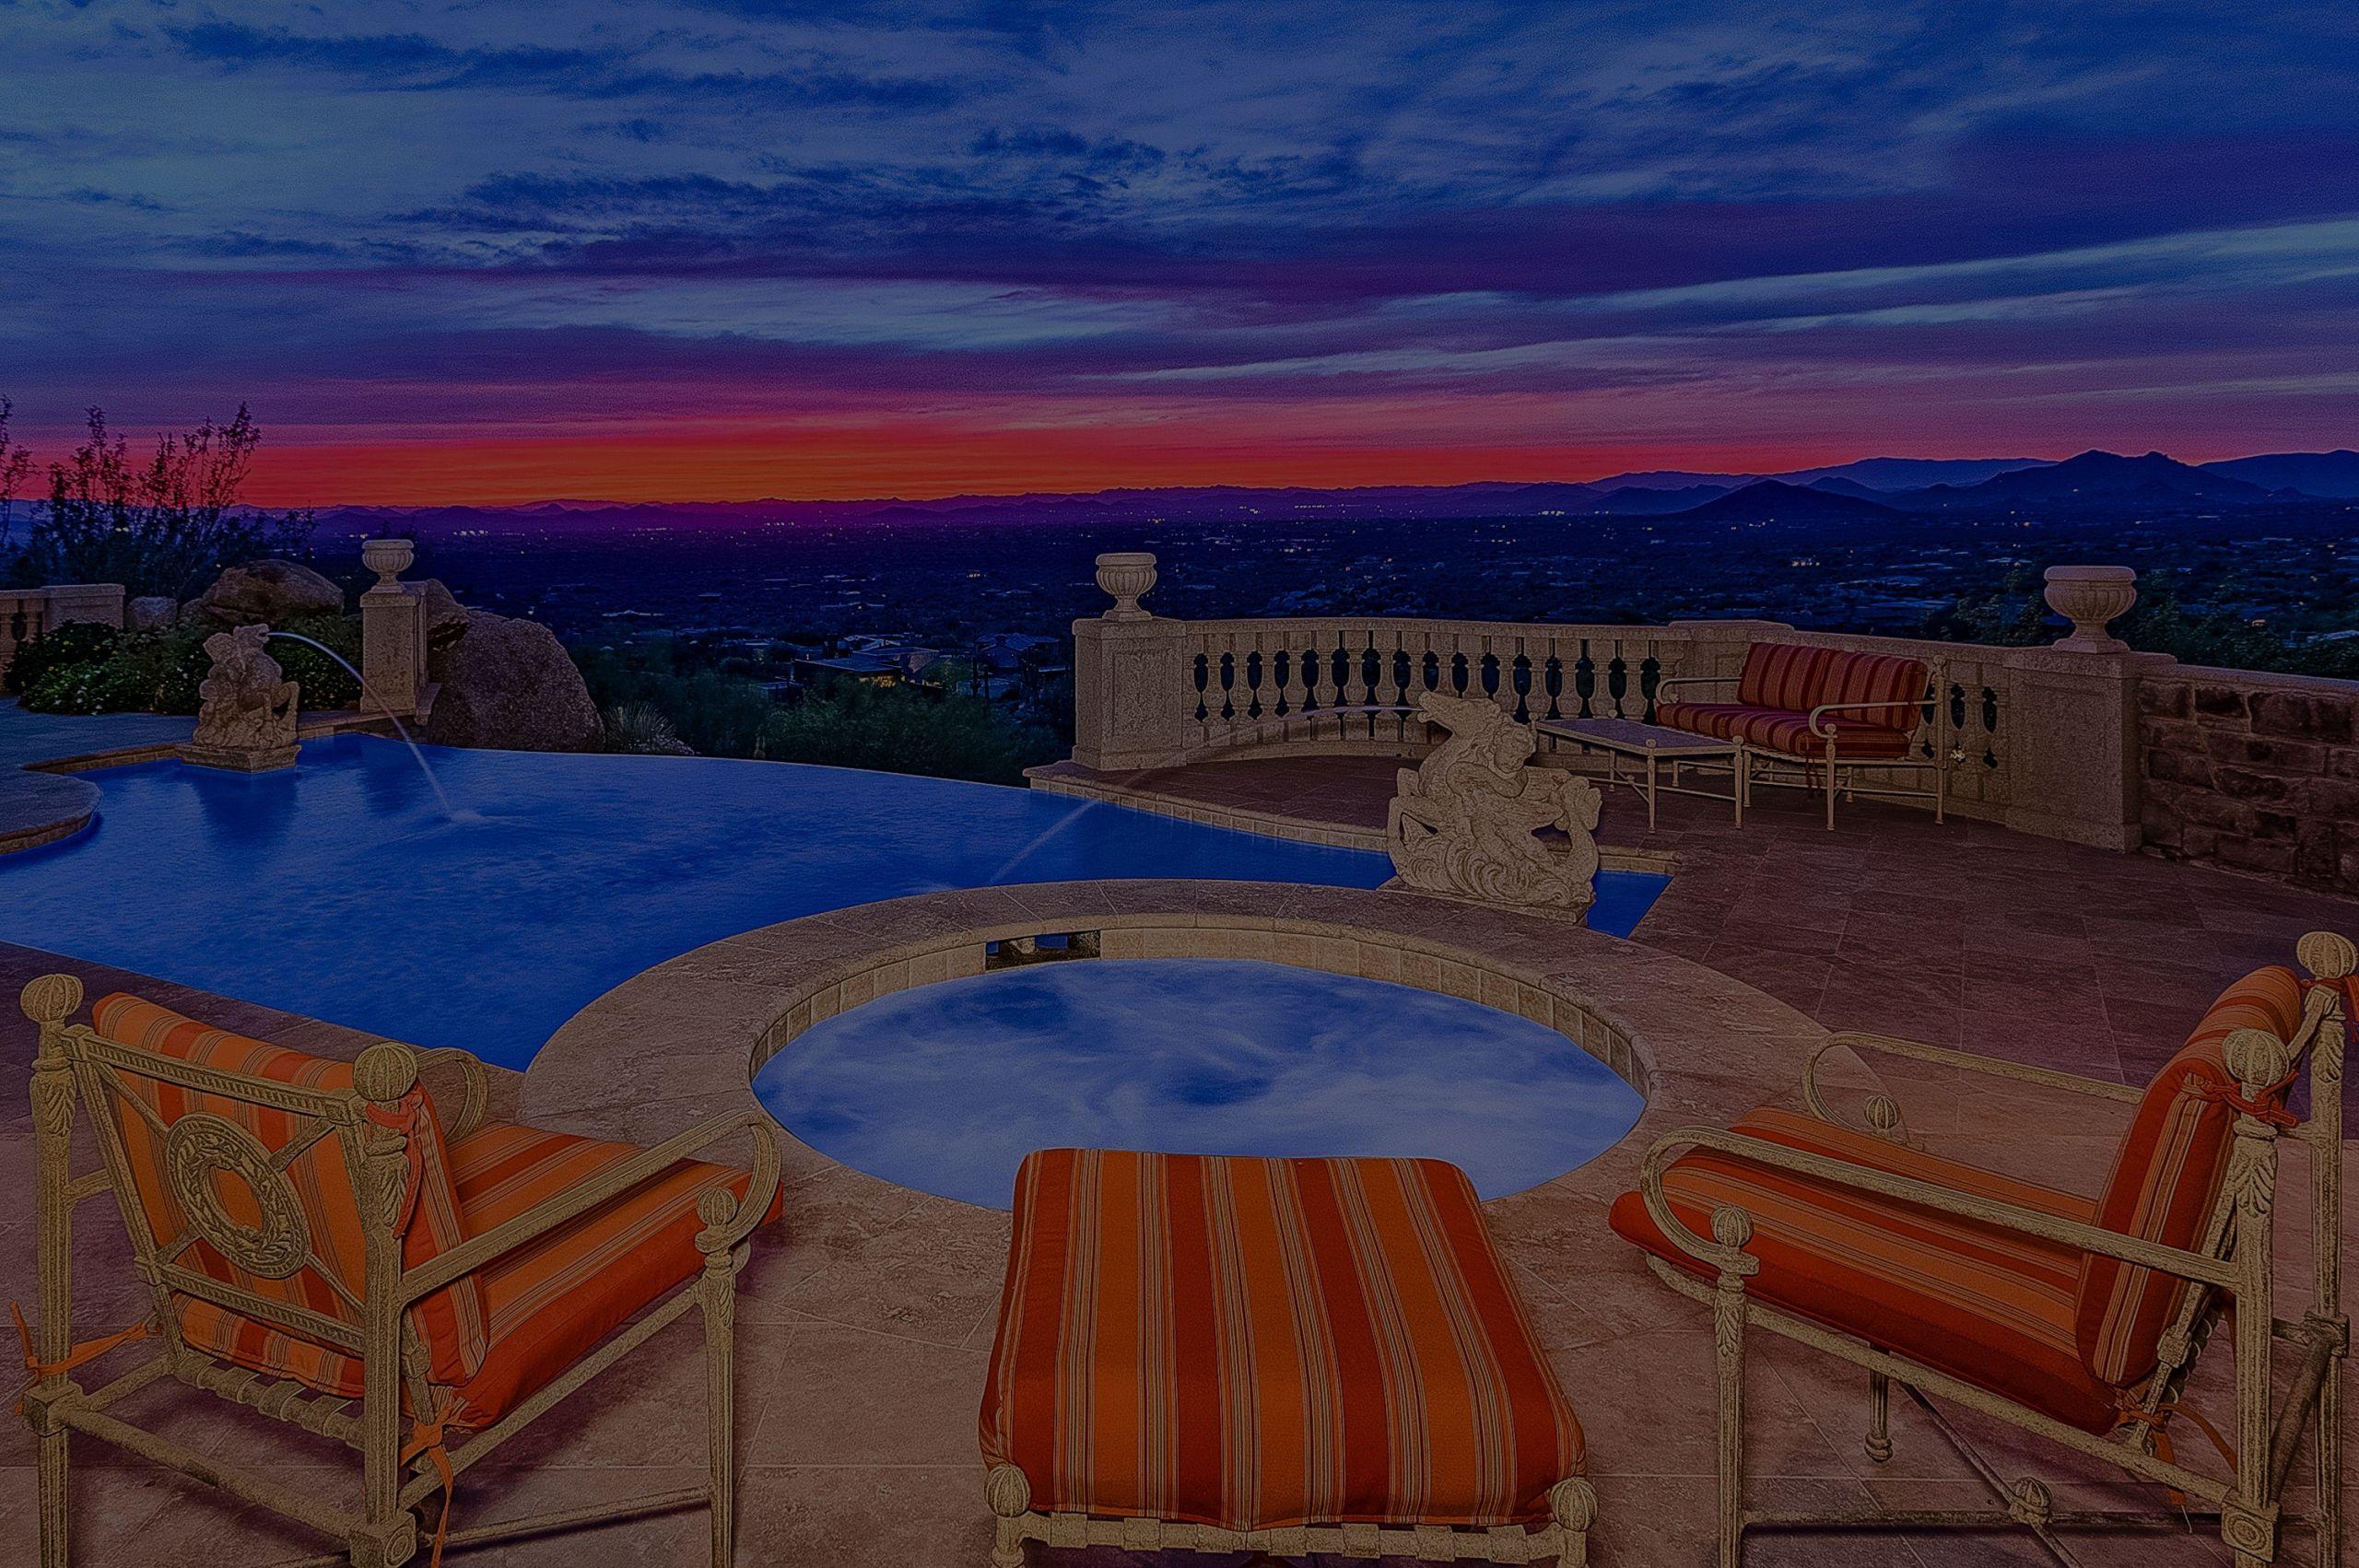 VanessaAndrews.com West View Carefree Arizona